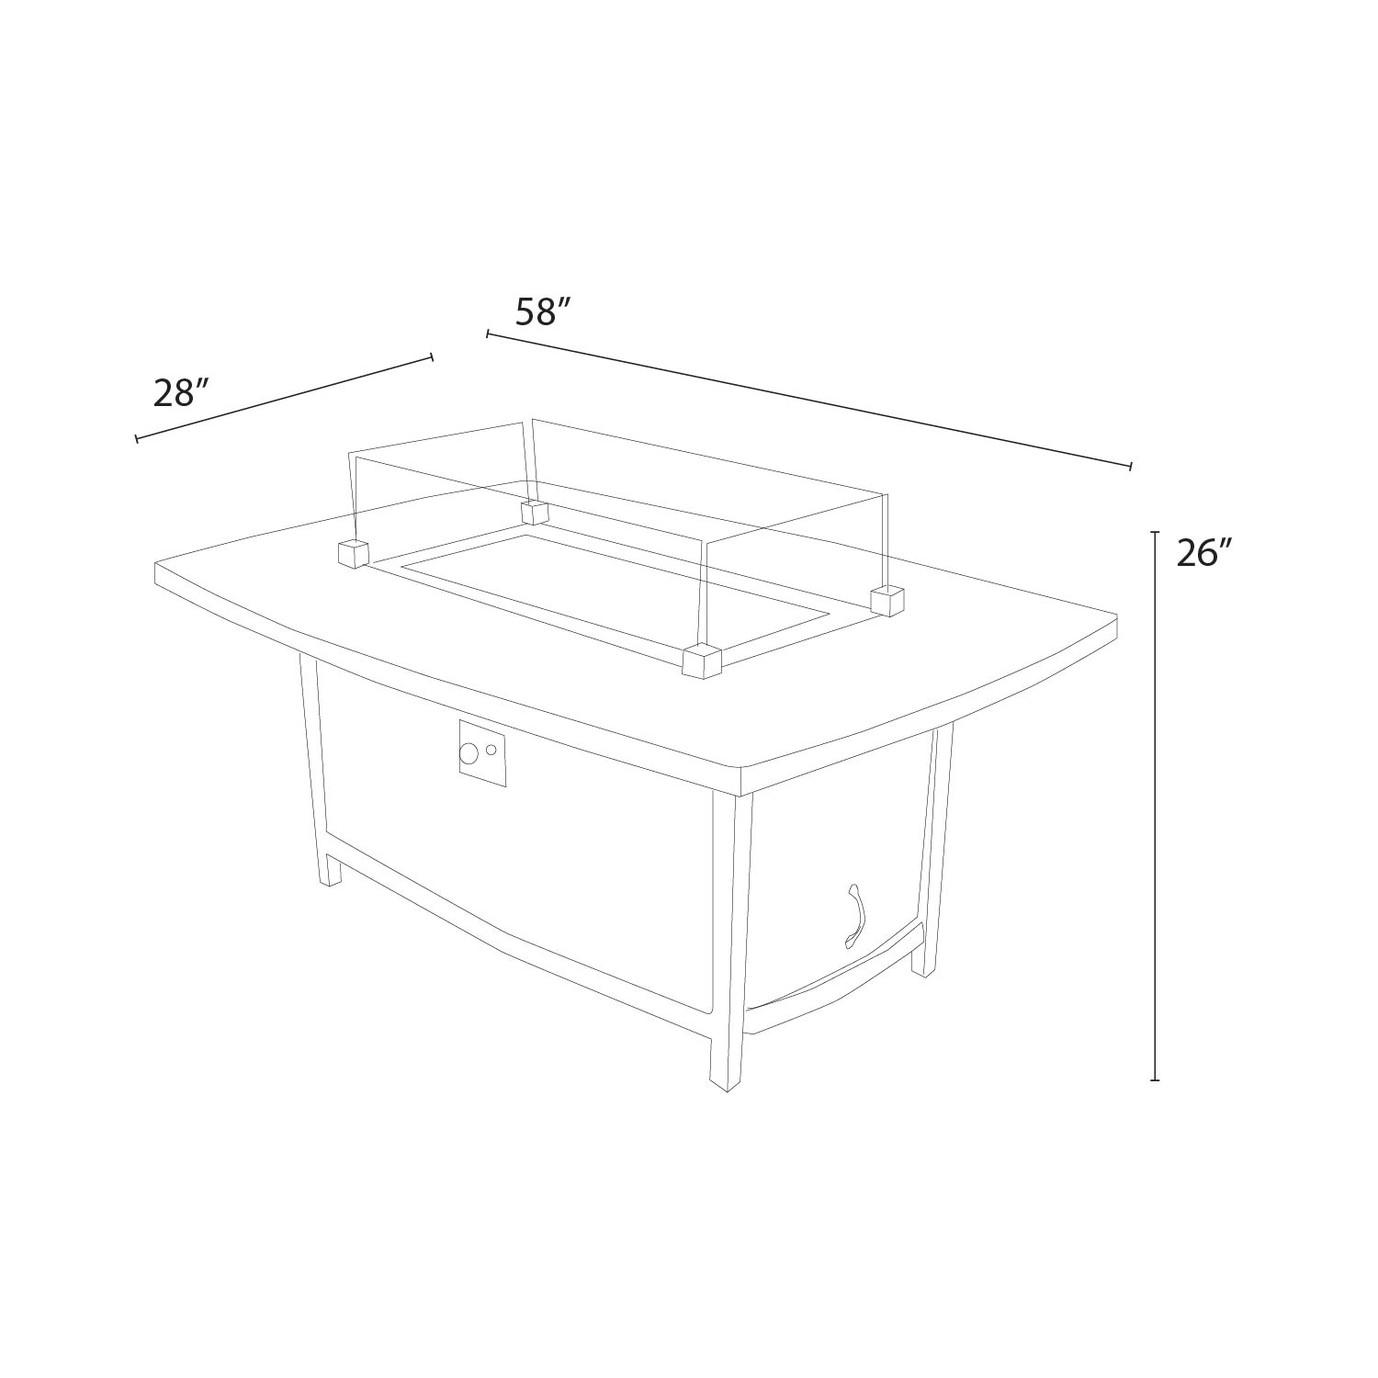 Vistano™ Stone Top Coffee Fire Table